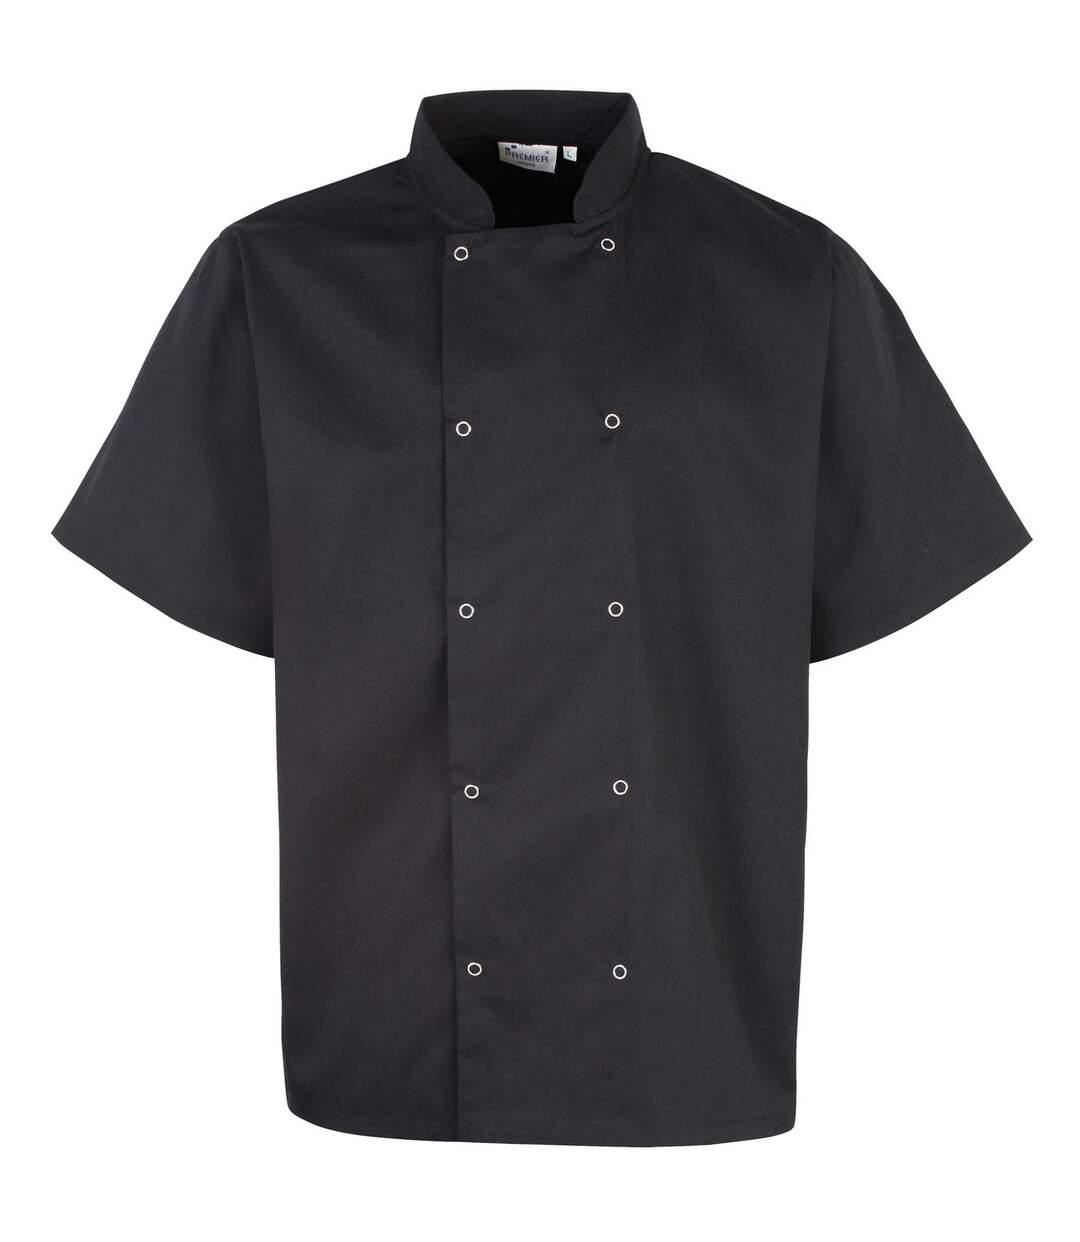 Premier Unisex Studded Front Short Sleeve Chefs Jacket (Pack of 2) (Black) - UTRW6824